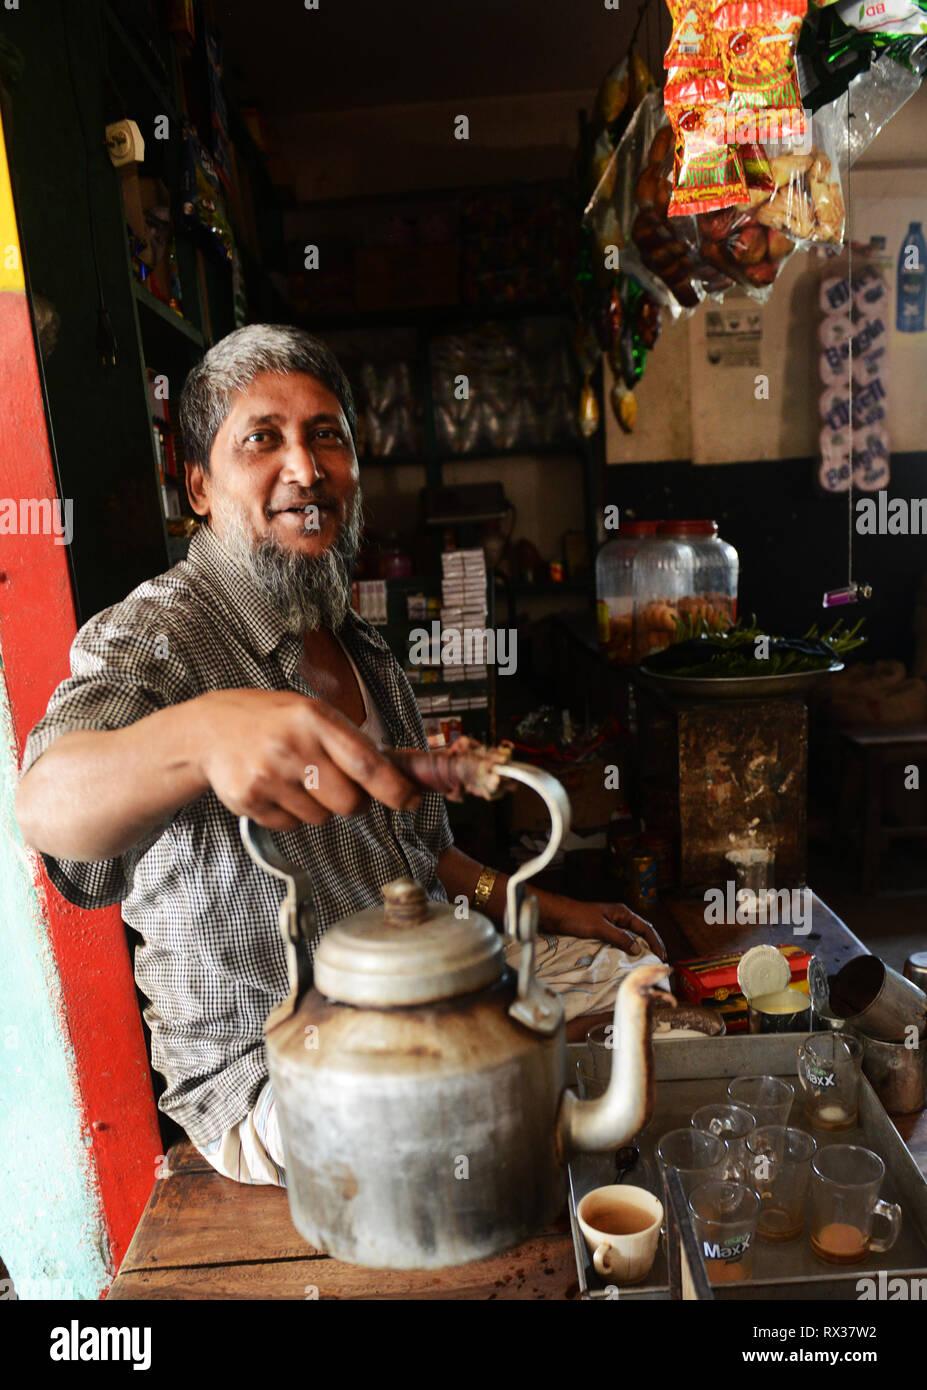 A Bangladeshi man preparing Bangladeshi tea. - Stock Image